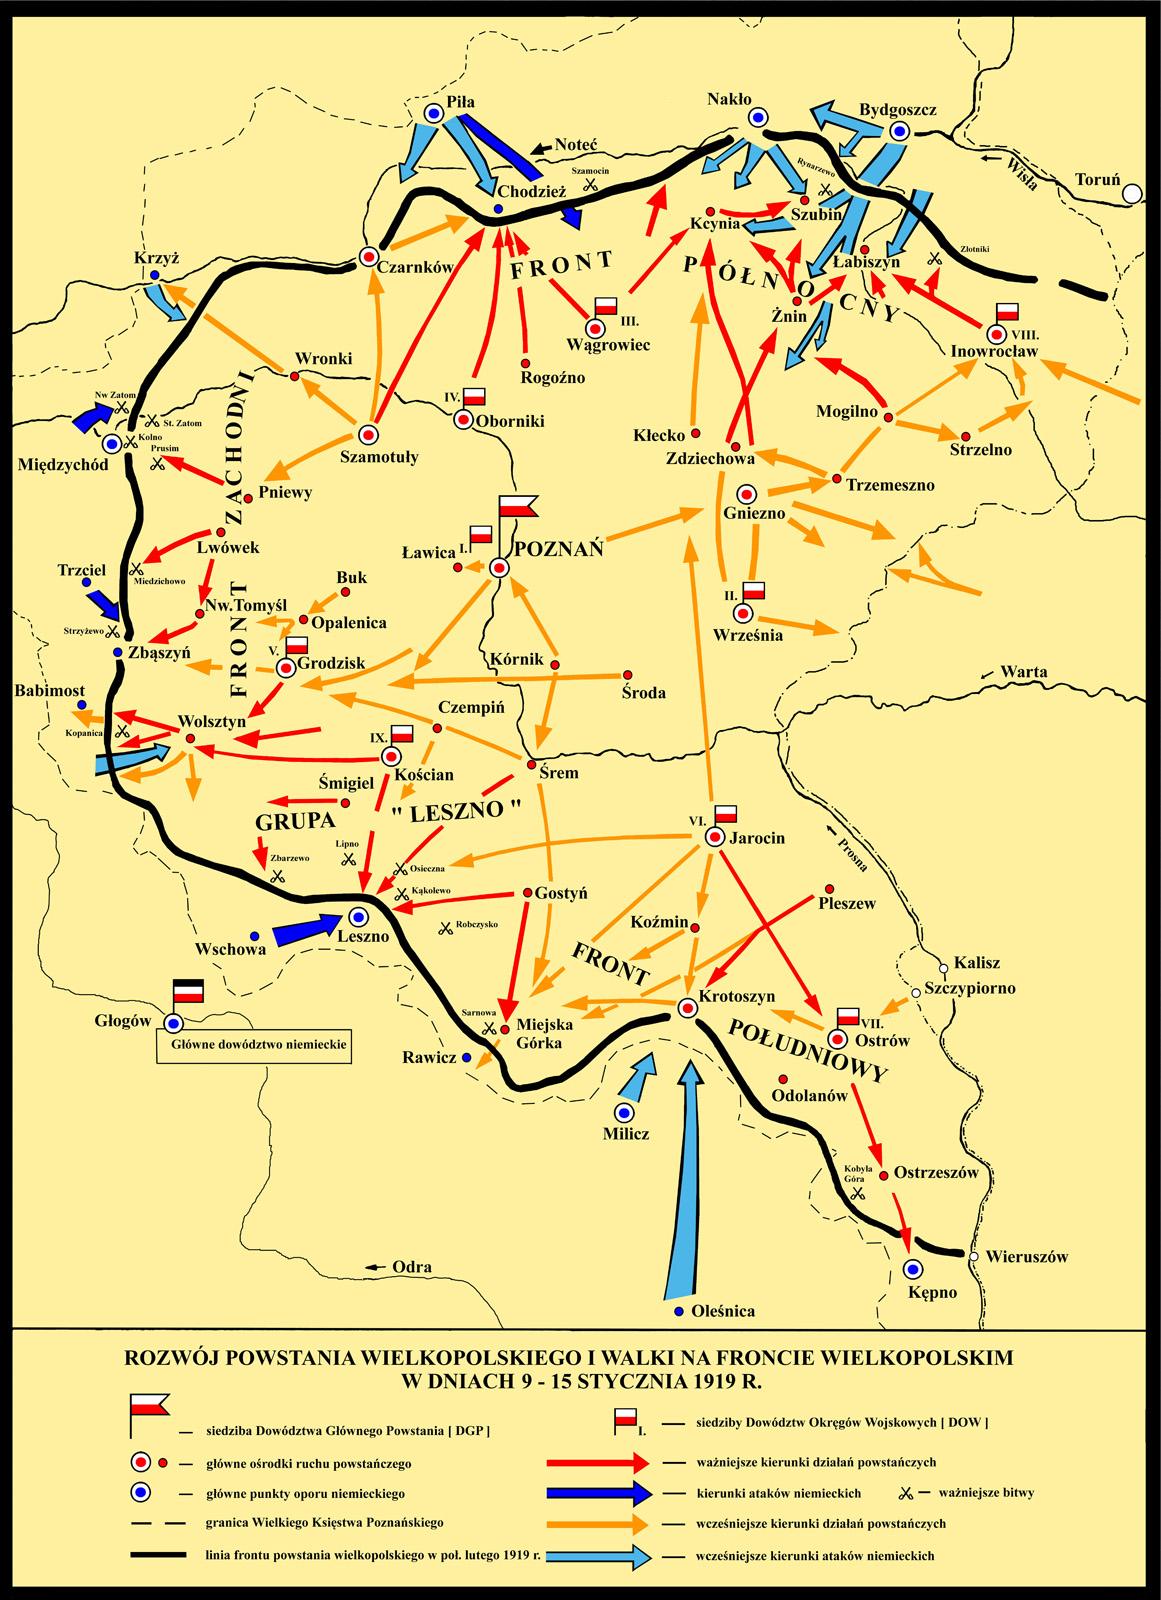 Развитие восстания и бои 9-15 января 1919 г.